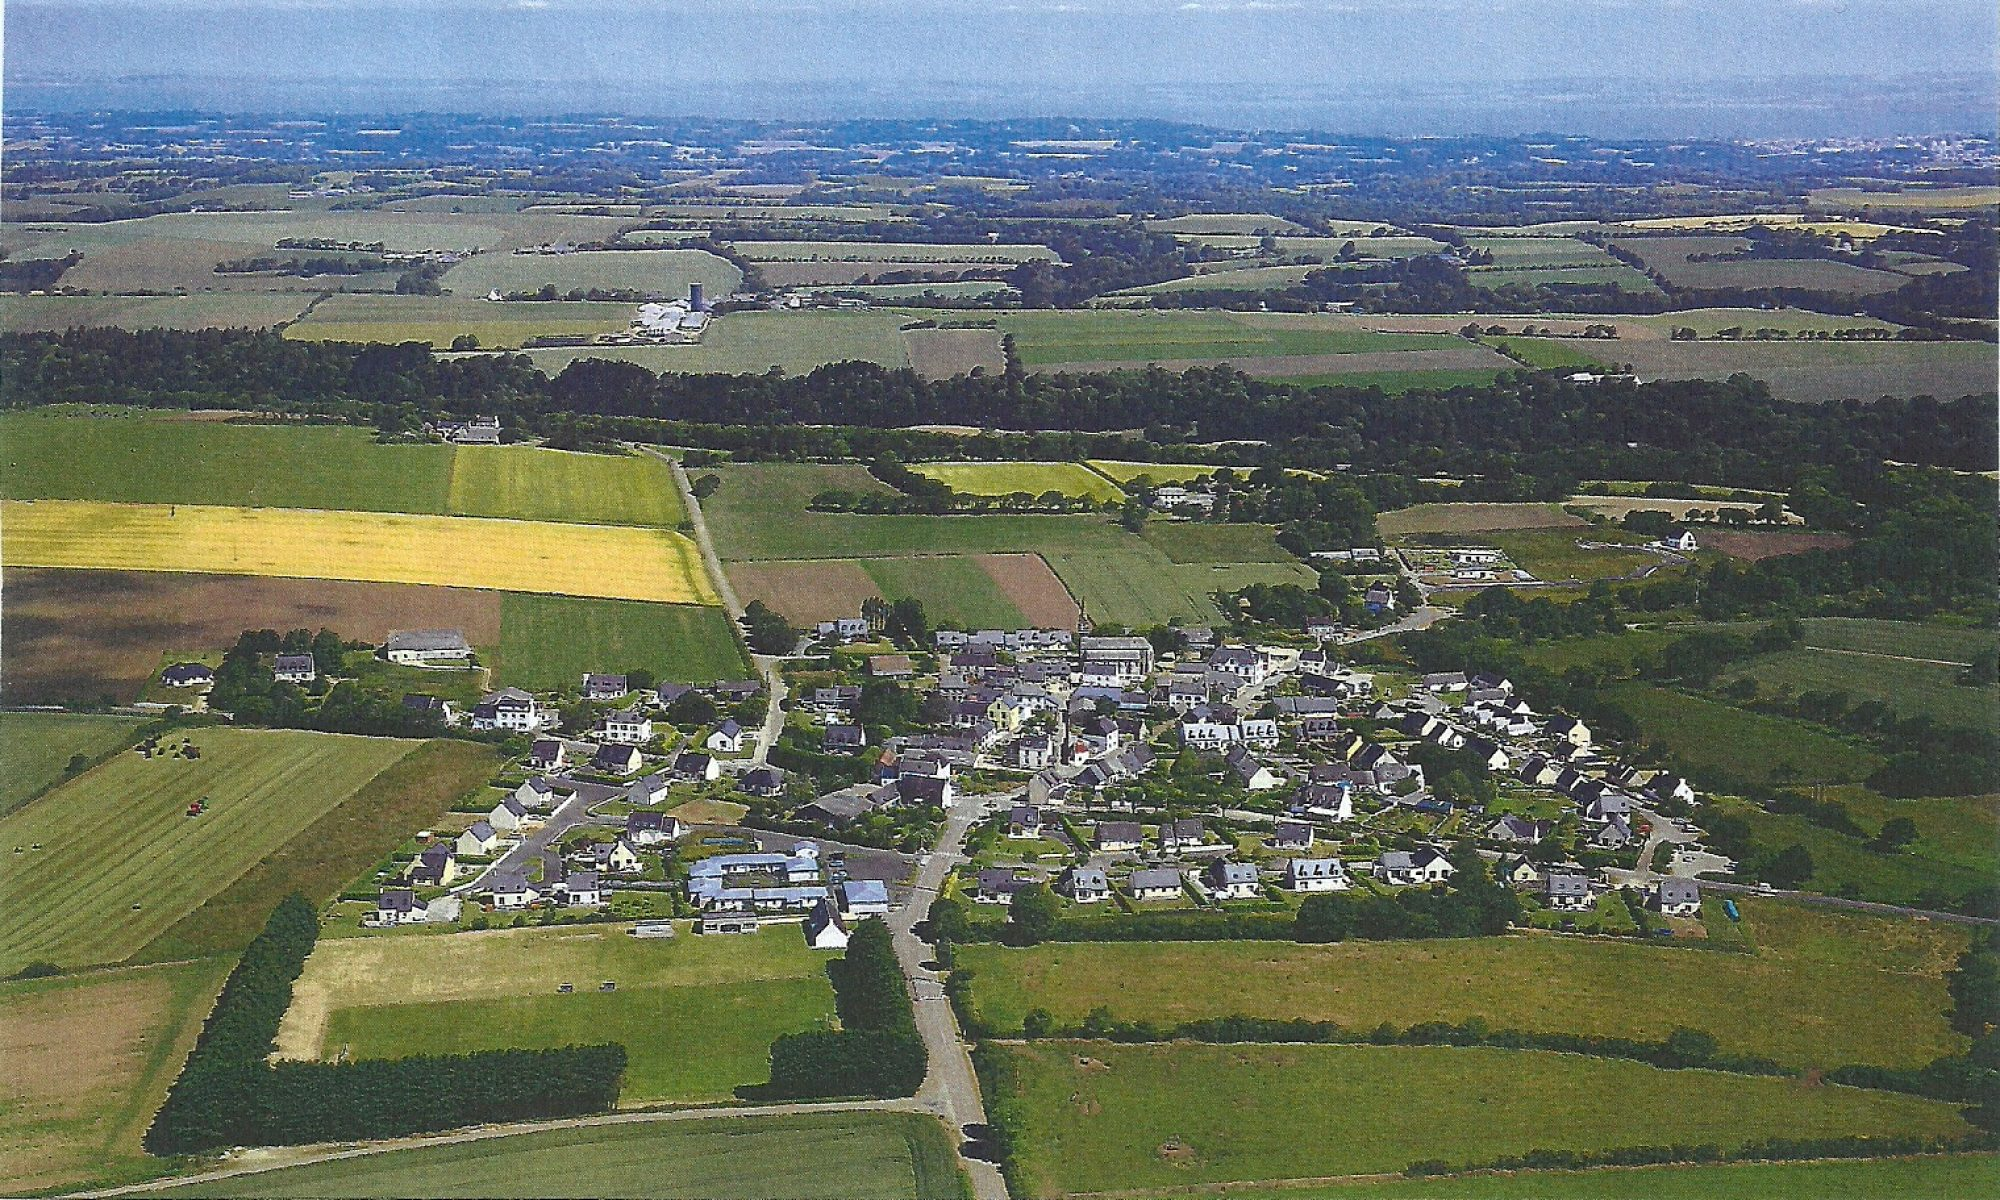 Guiler-sur-Goyen